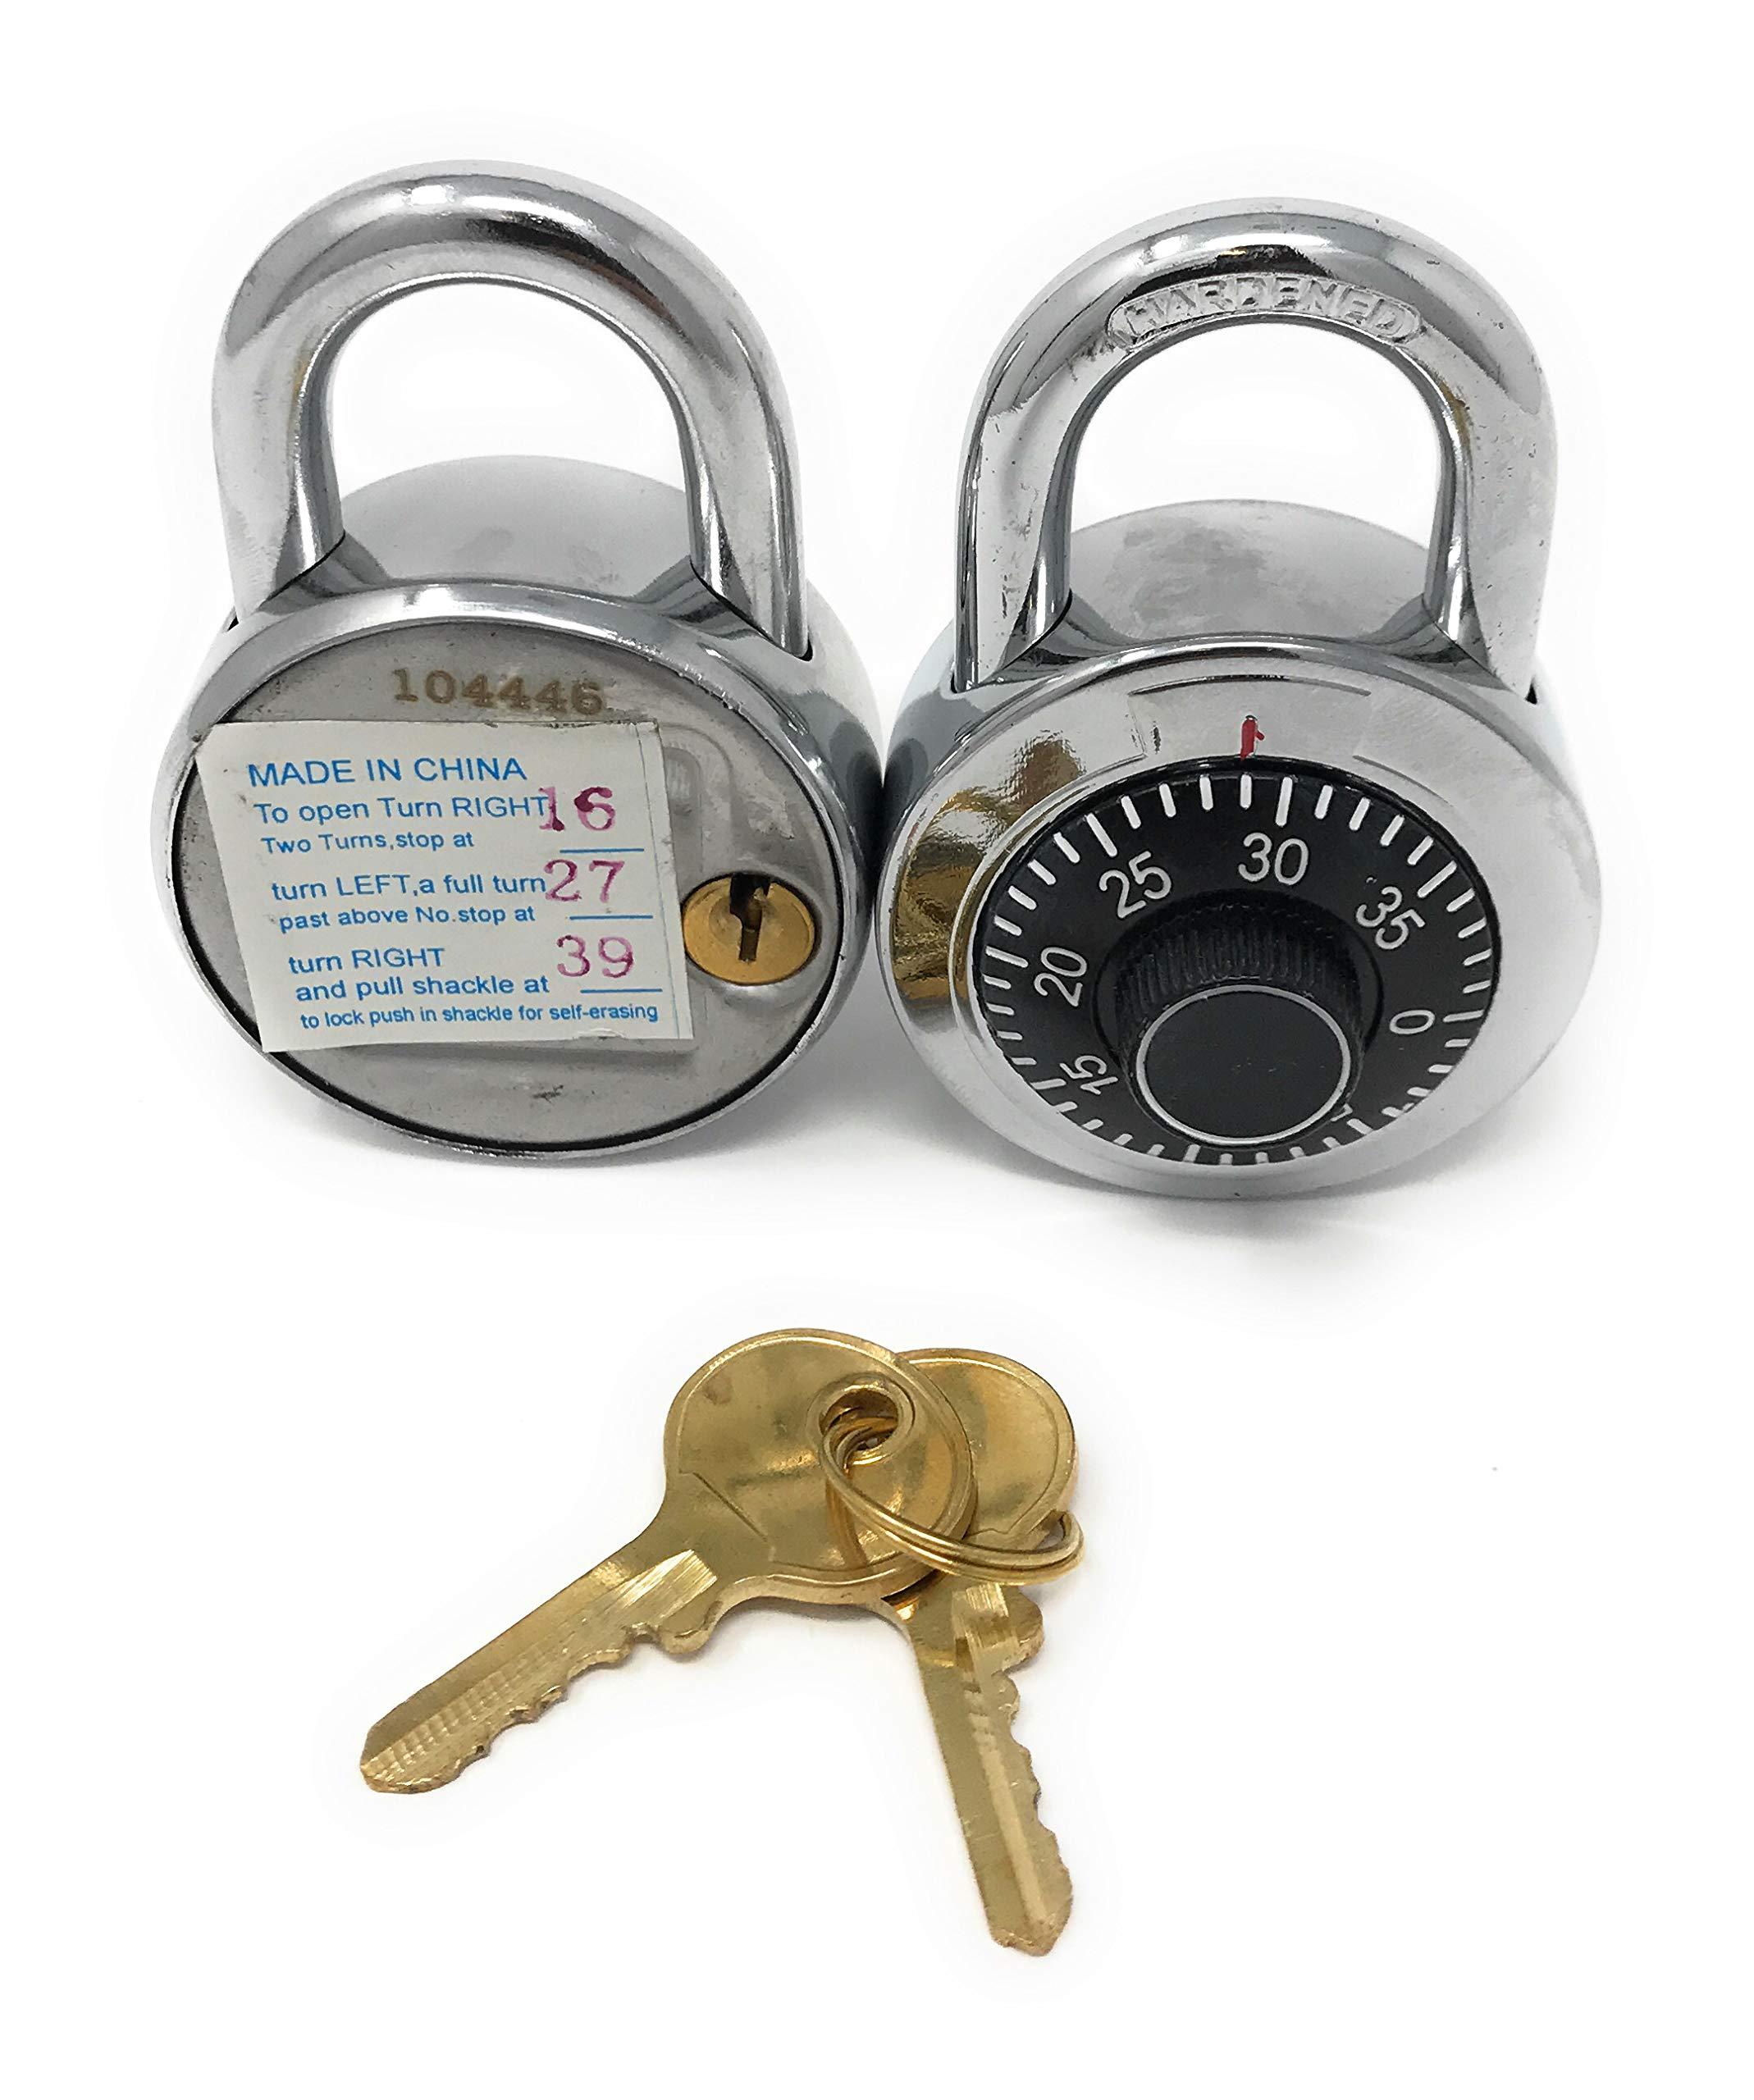 Combination Locks with Single Override Control Key Padlocks Ideal for Lockers [946-10] - Set of 10 Candados de Combinacion by Madol (Image #2)